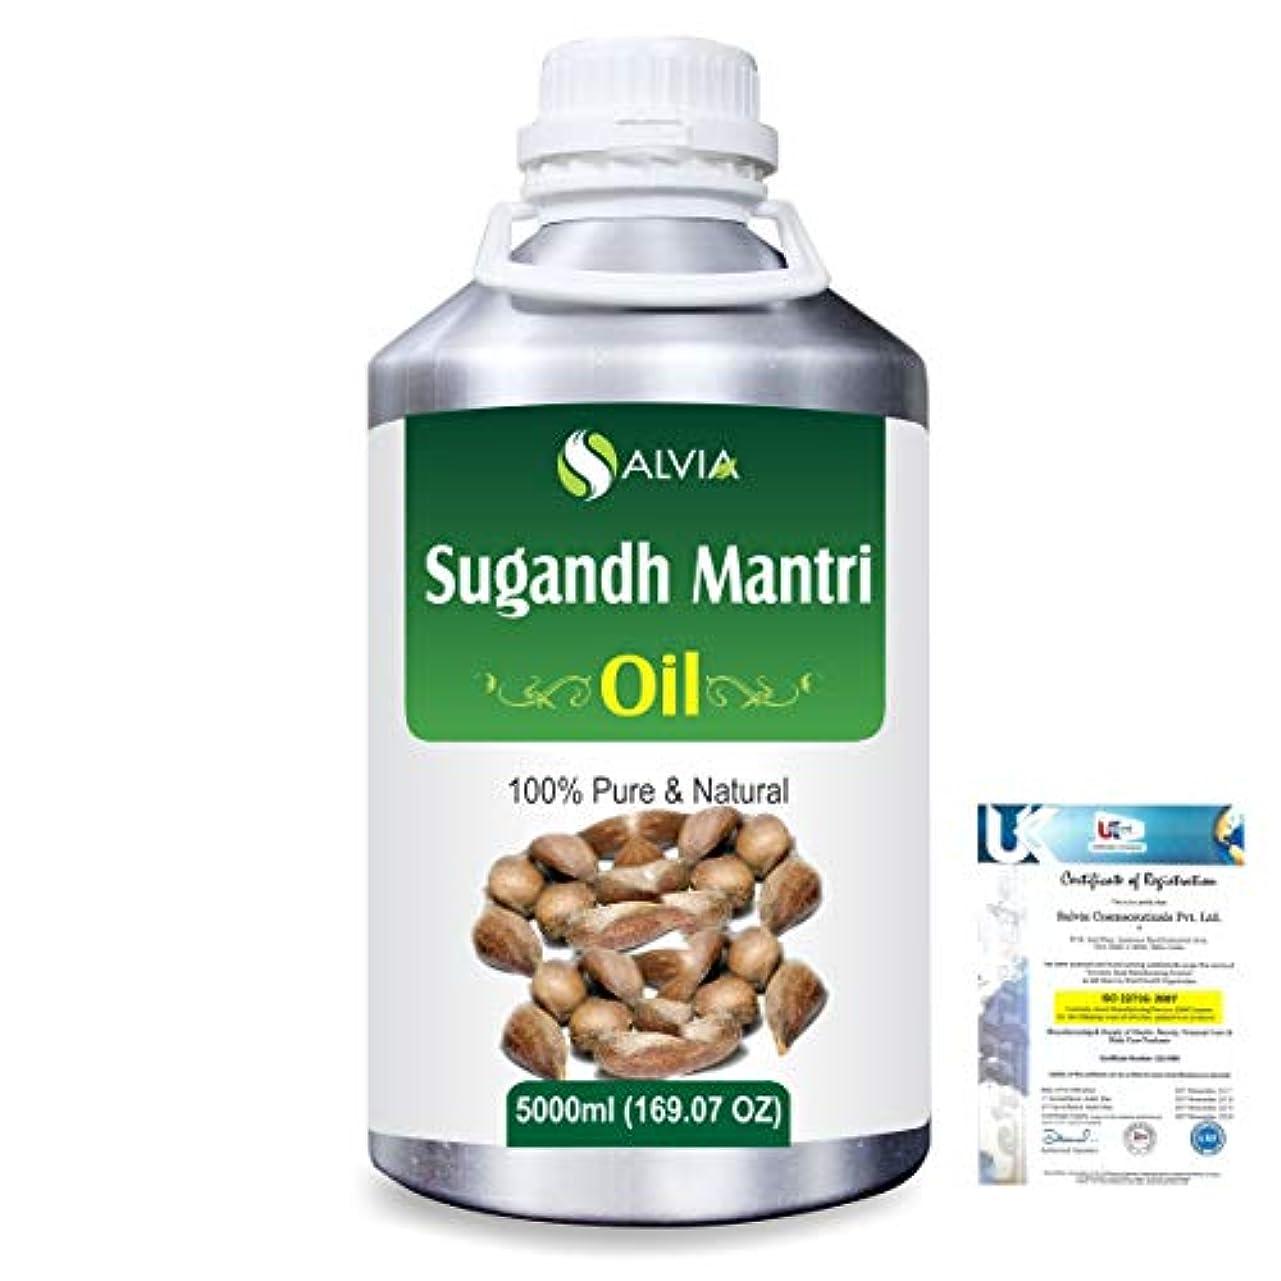 Sugandh Mantri (Homalomena aromatic) 100% Natural Pure Essential Oil 5000ml/169fl.oz.